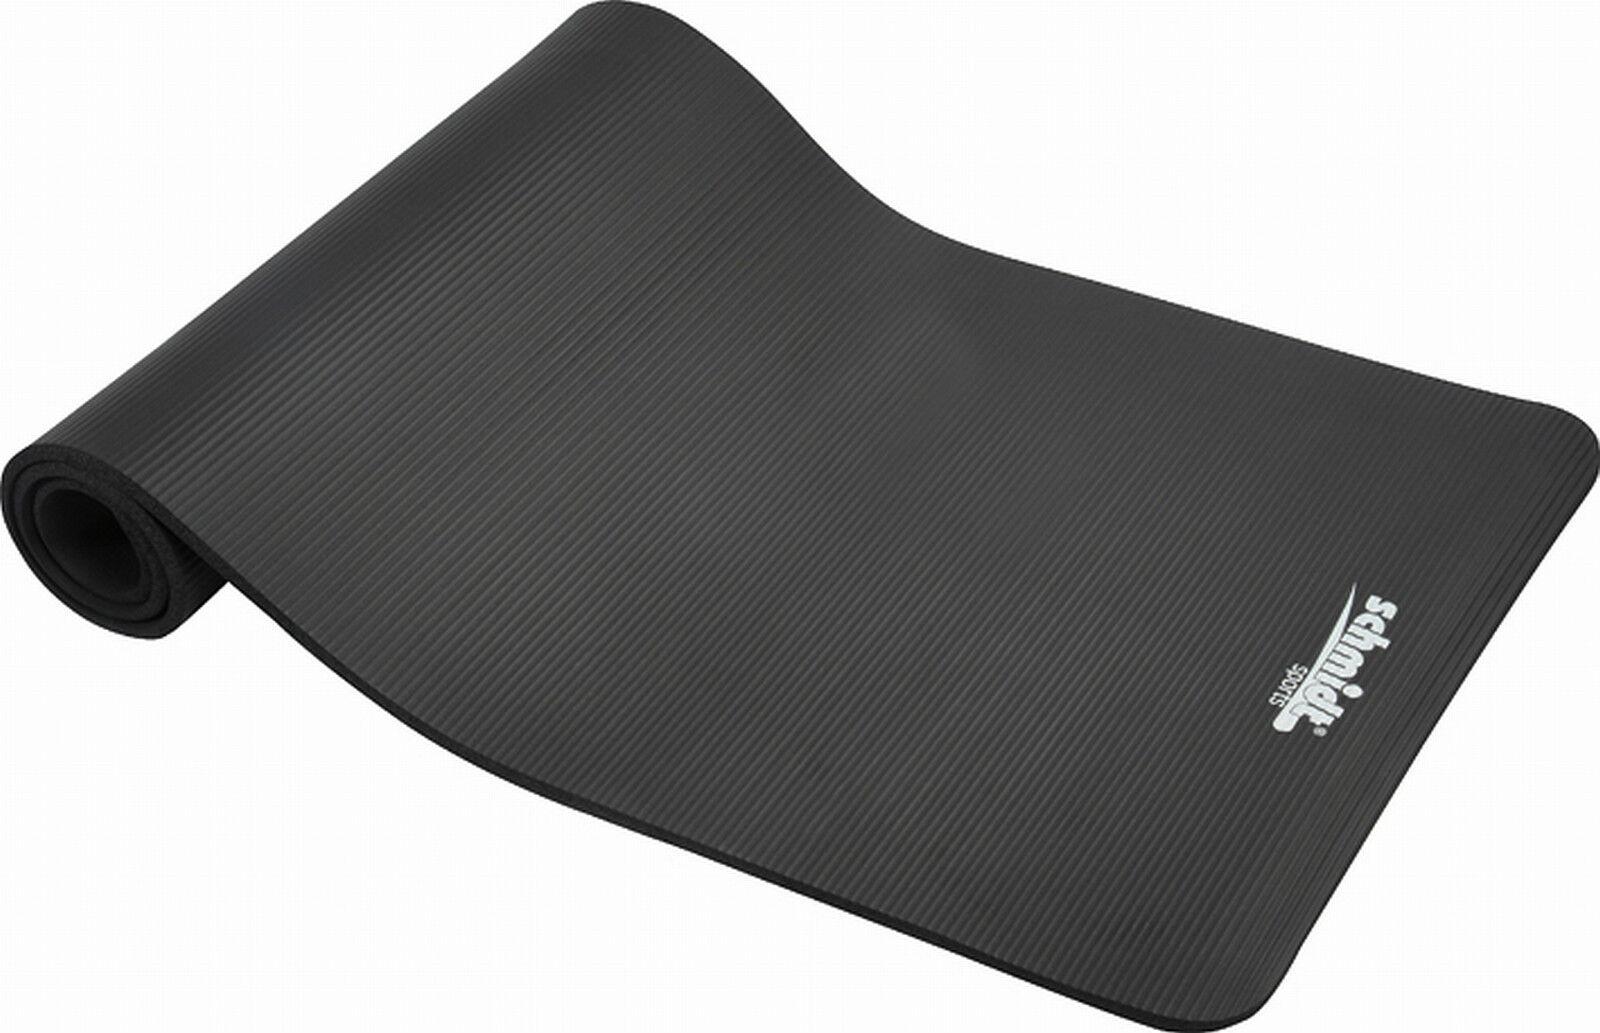 Deuser Matte black XL, Trainingsmatte, Yoga-Matte. Schaumstoff. Sehr griffest.